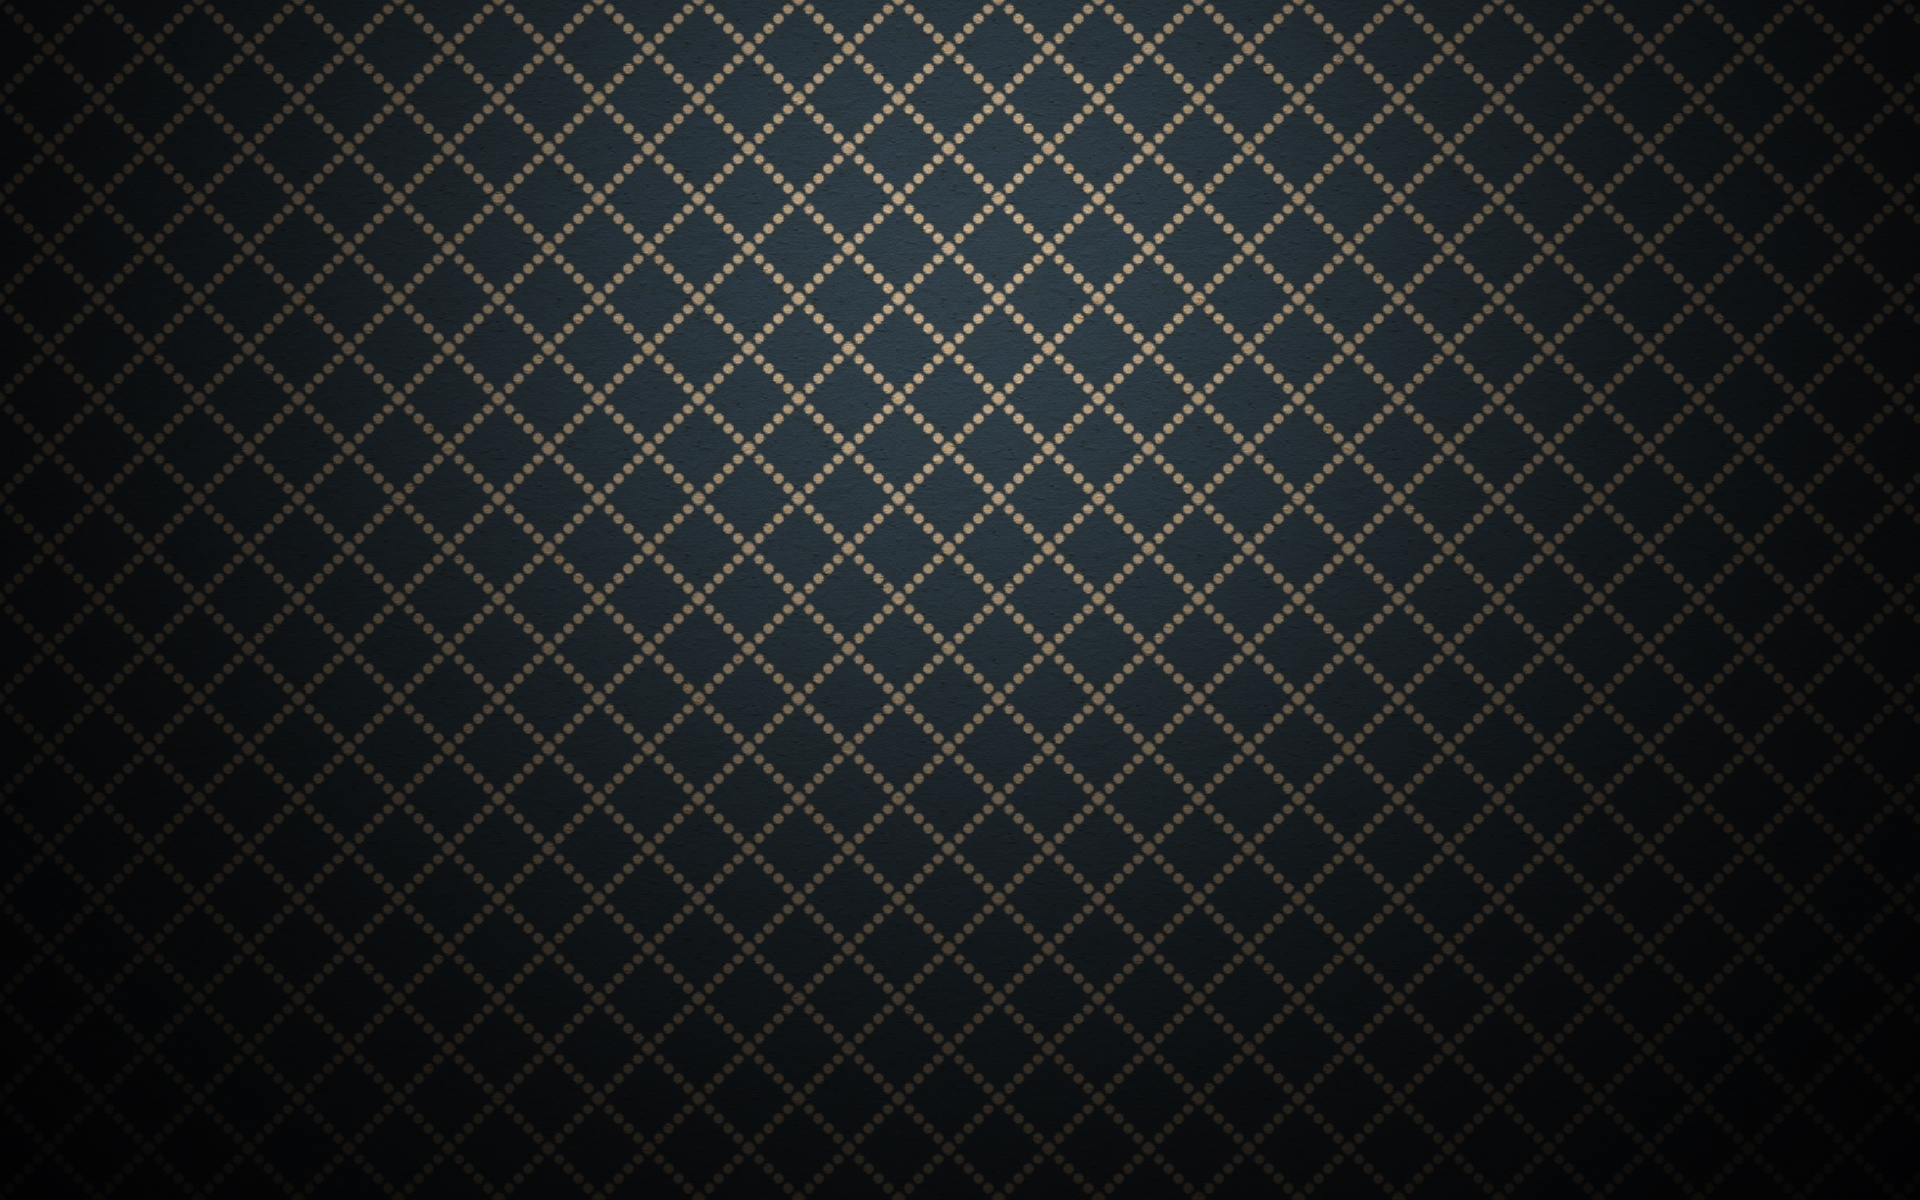 fabric plaid wallpaper hd - photo #14